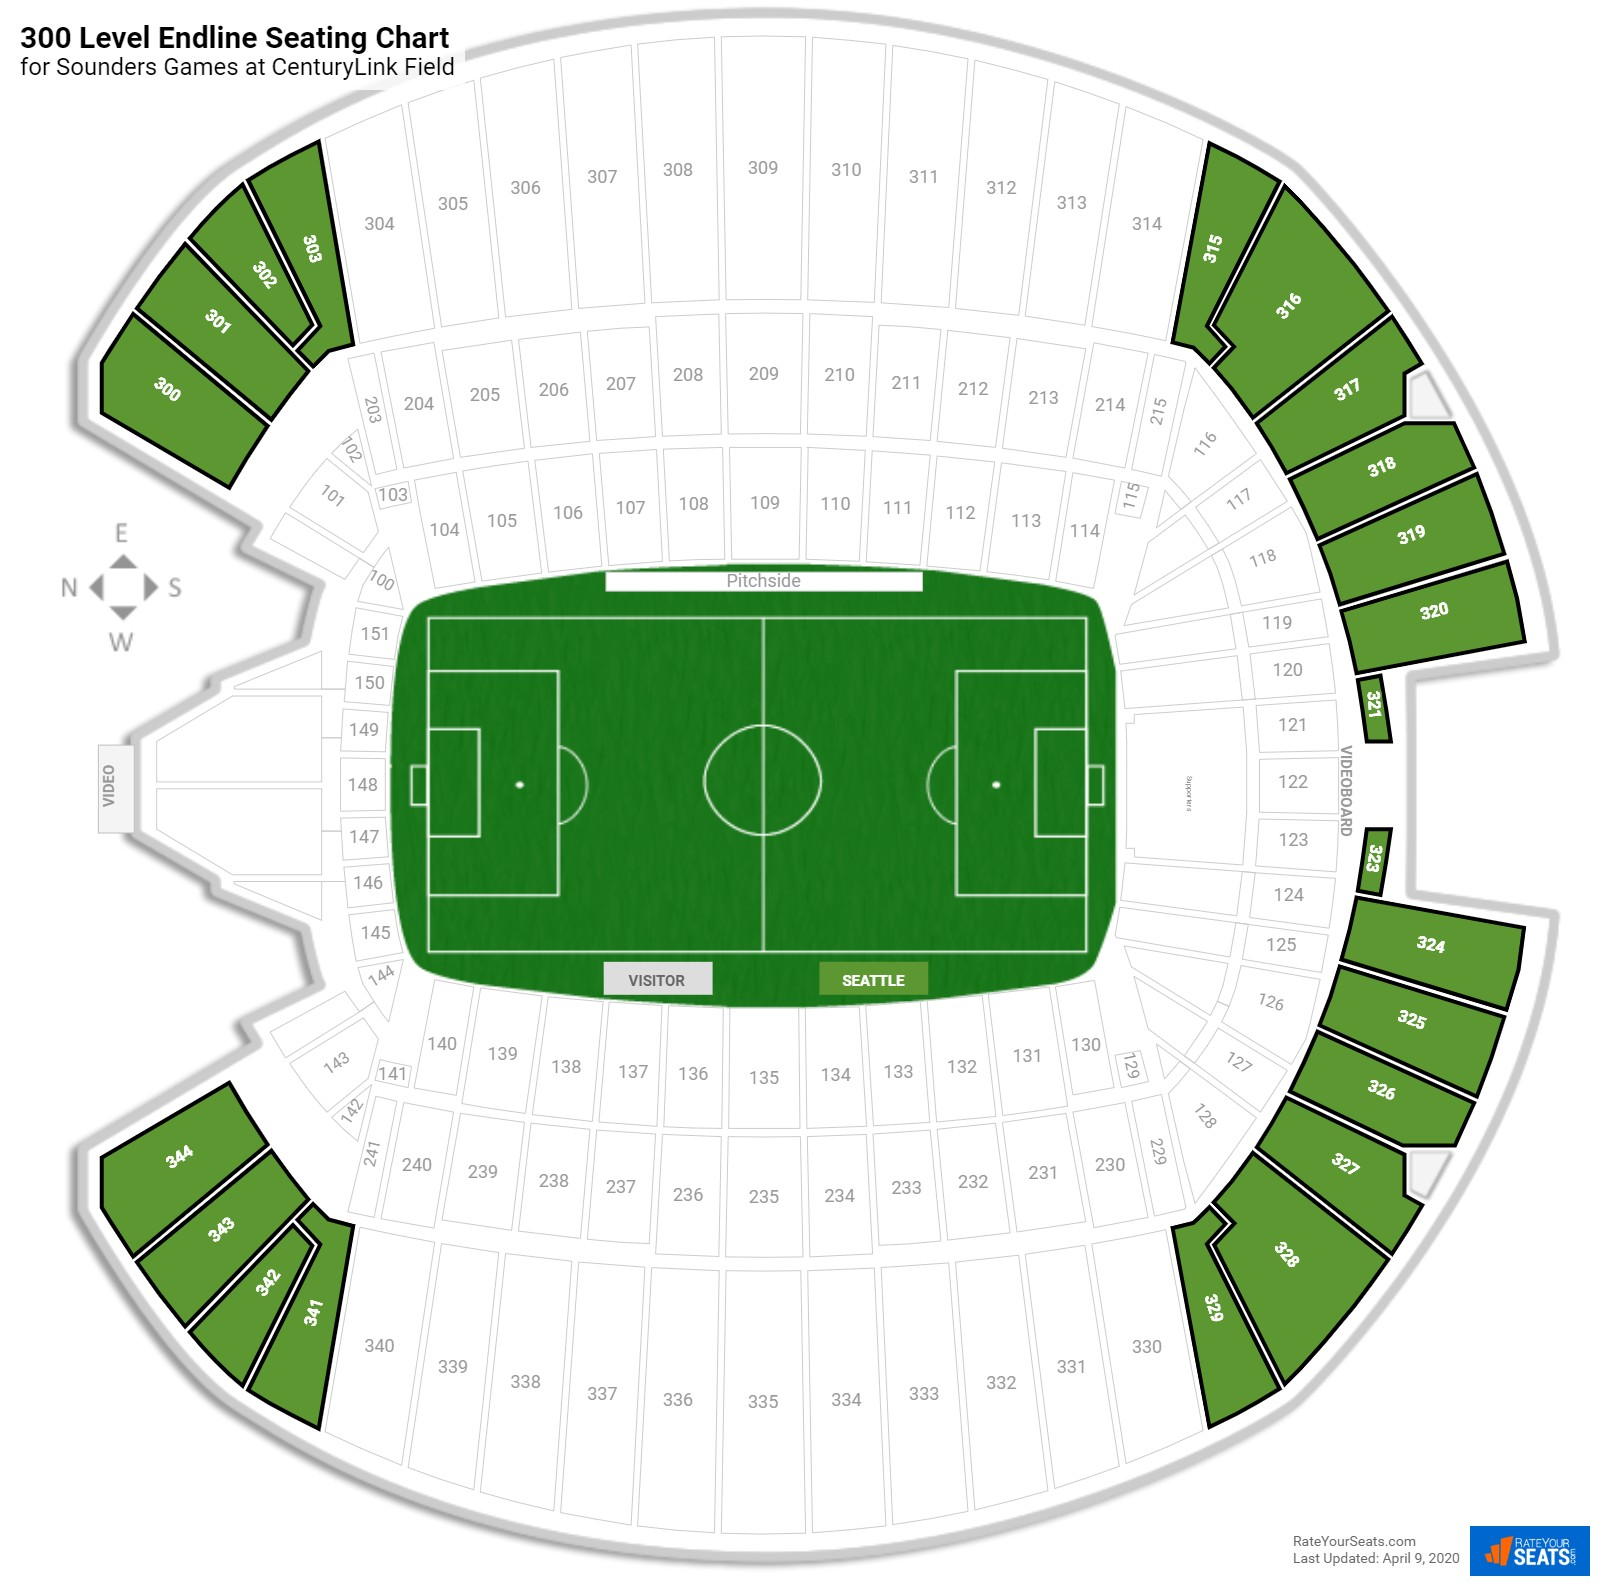 Centurylink Field Soccer Seating Guide Rateyourseatscom